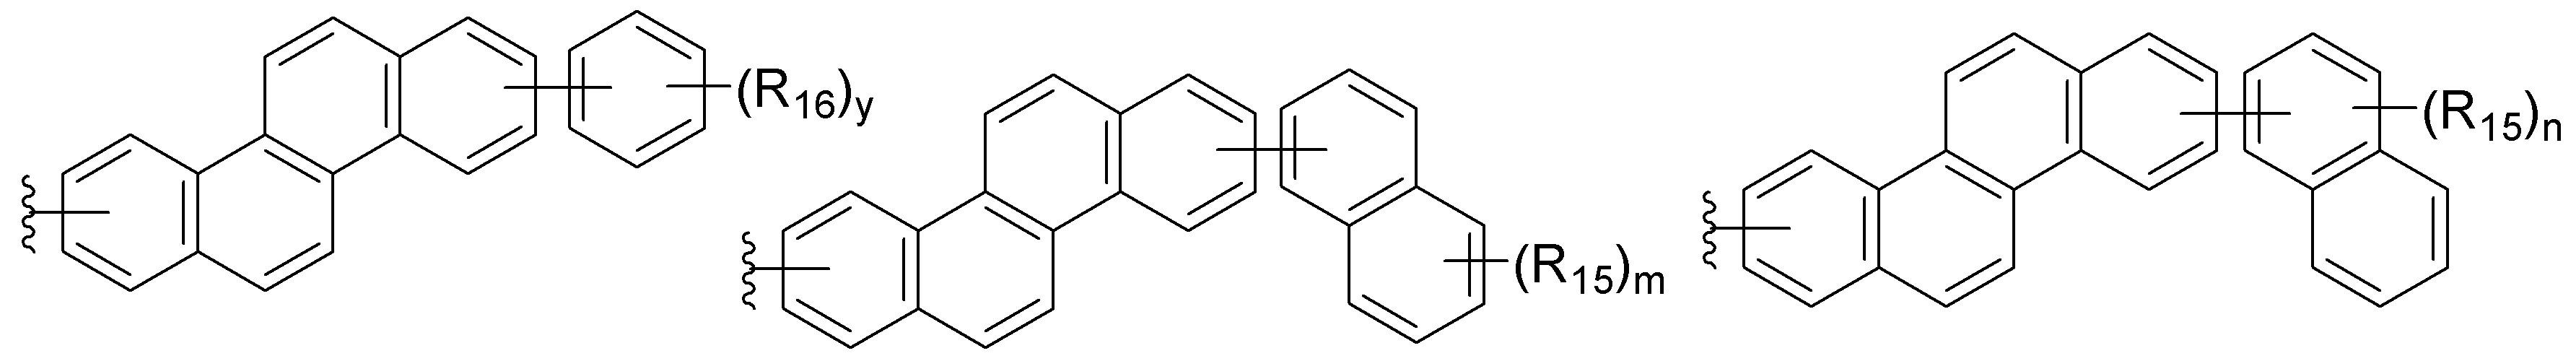 Figure 712009006163353-pat00681